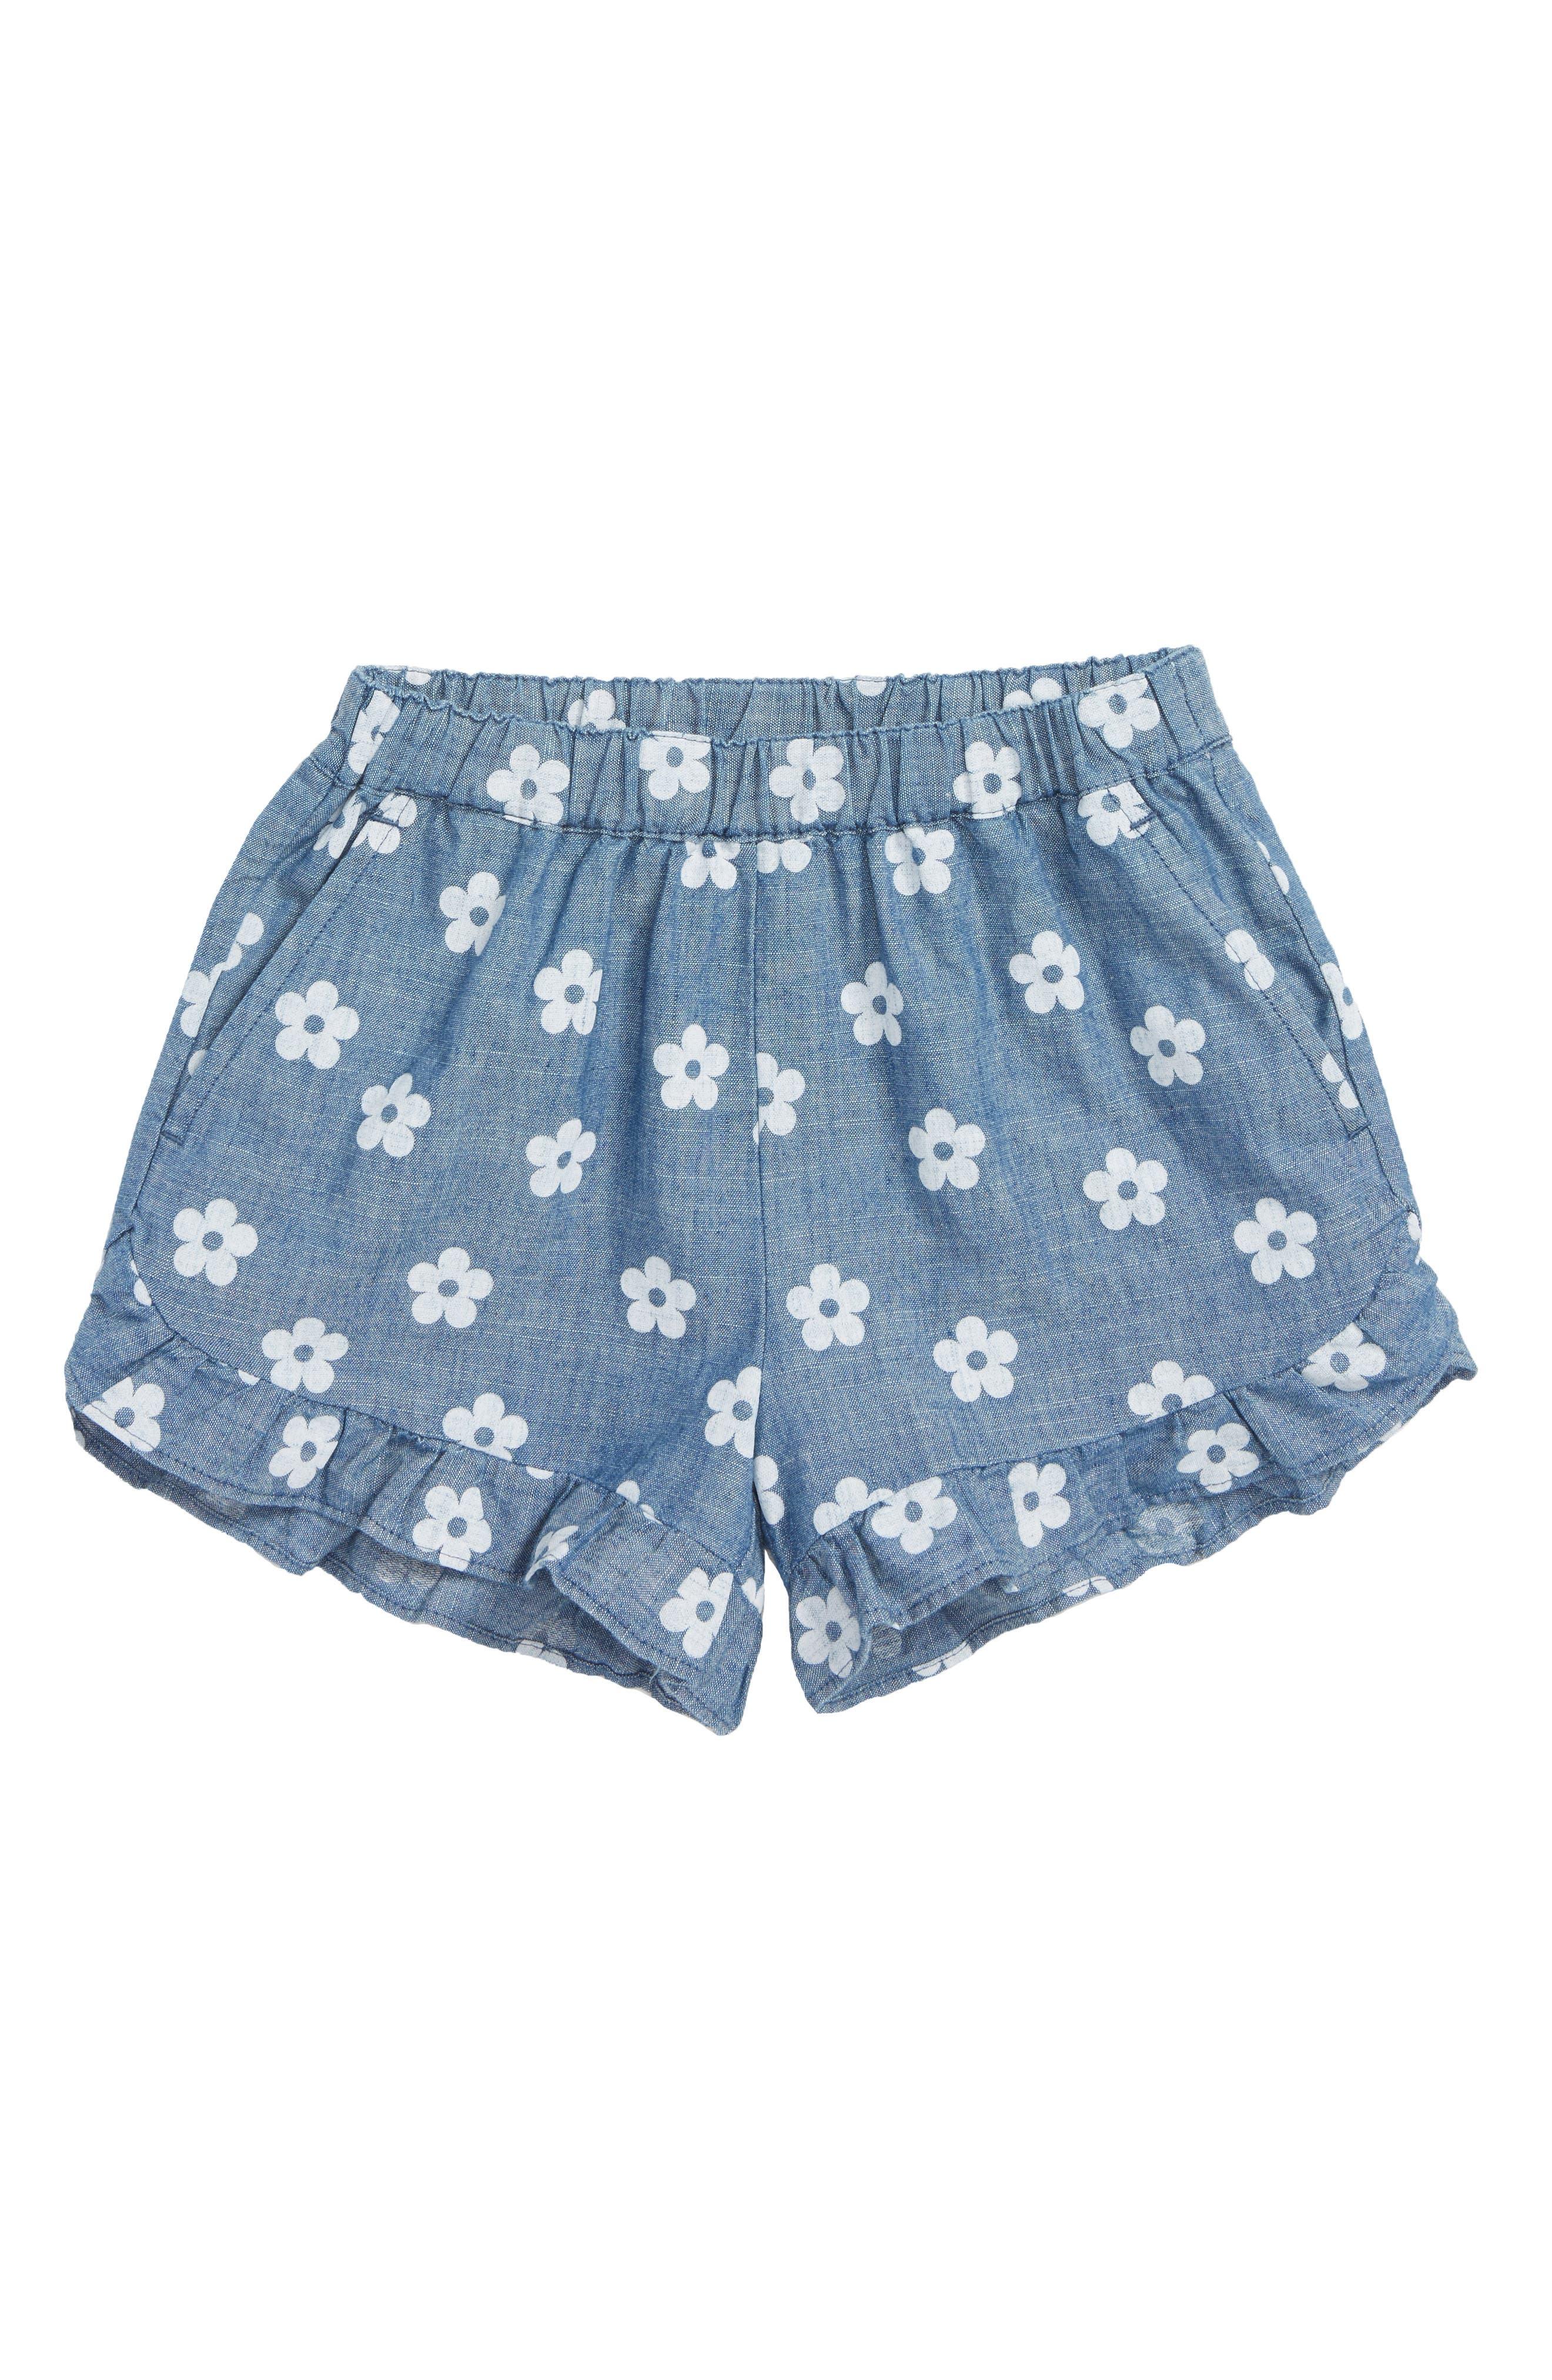 Lexi Daisy Print Ruffle Shorts,                             Main thumbnail 1, color,                             CHAMBRAY WHITE